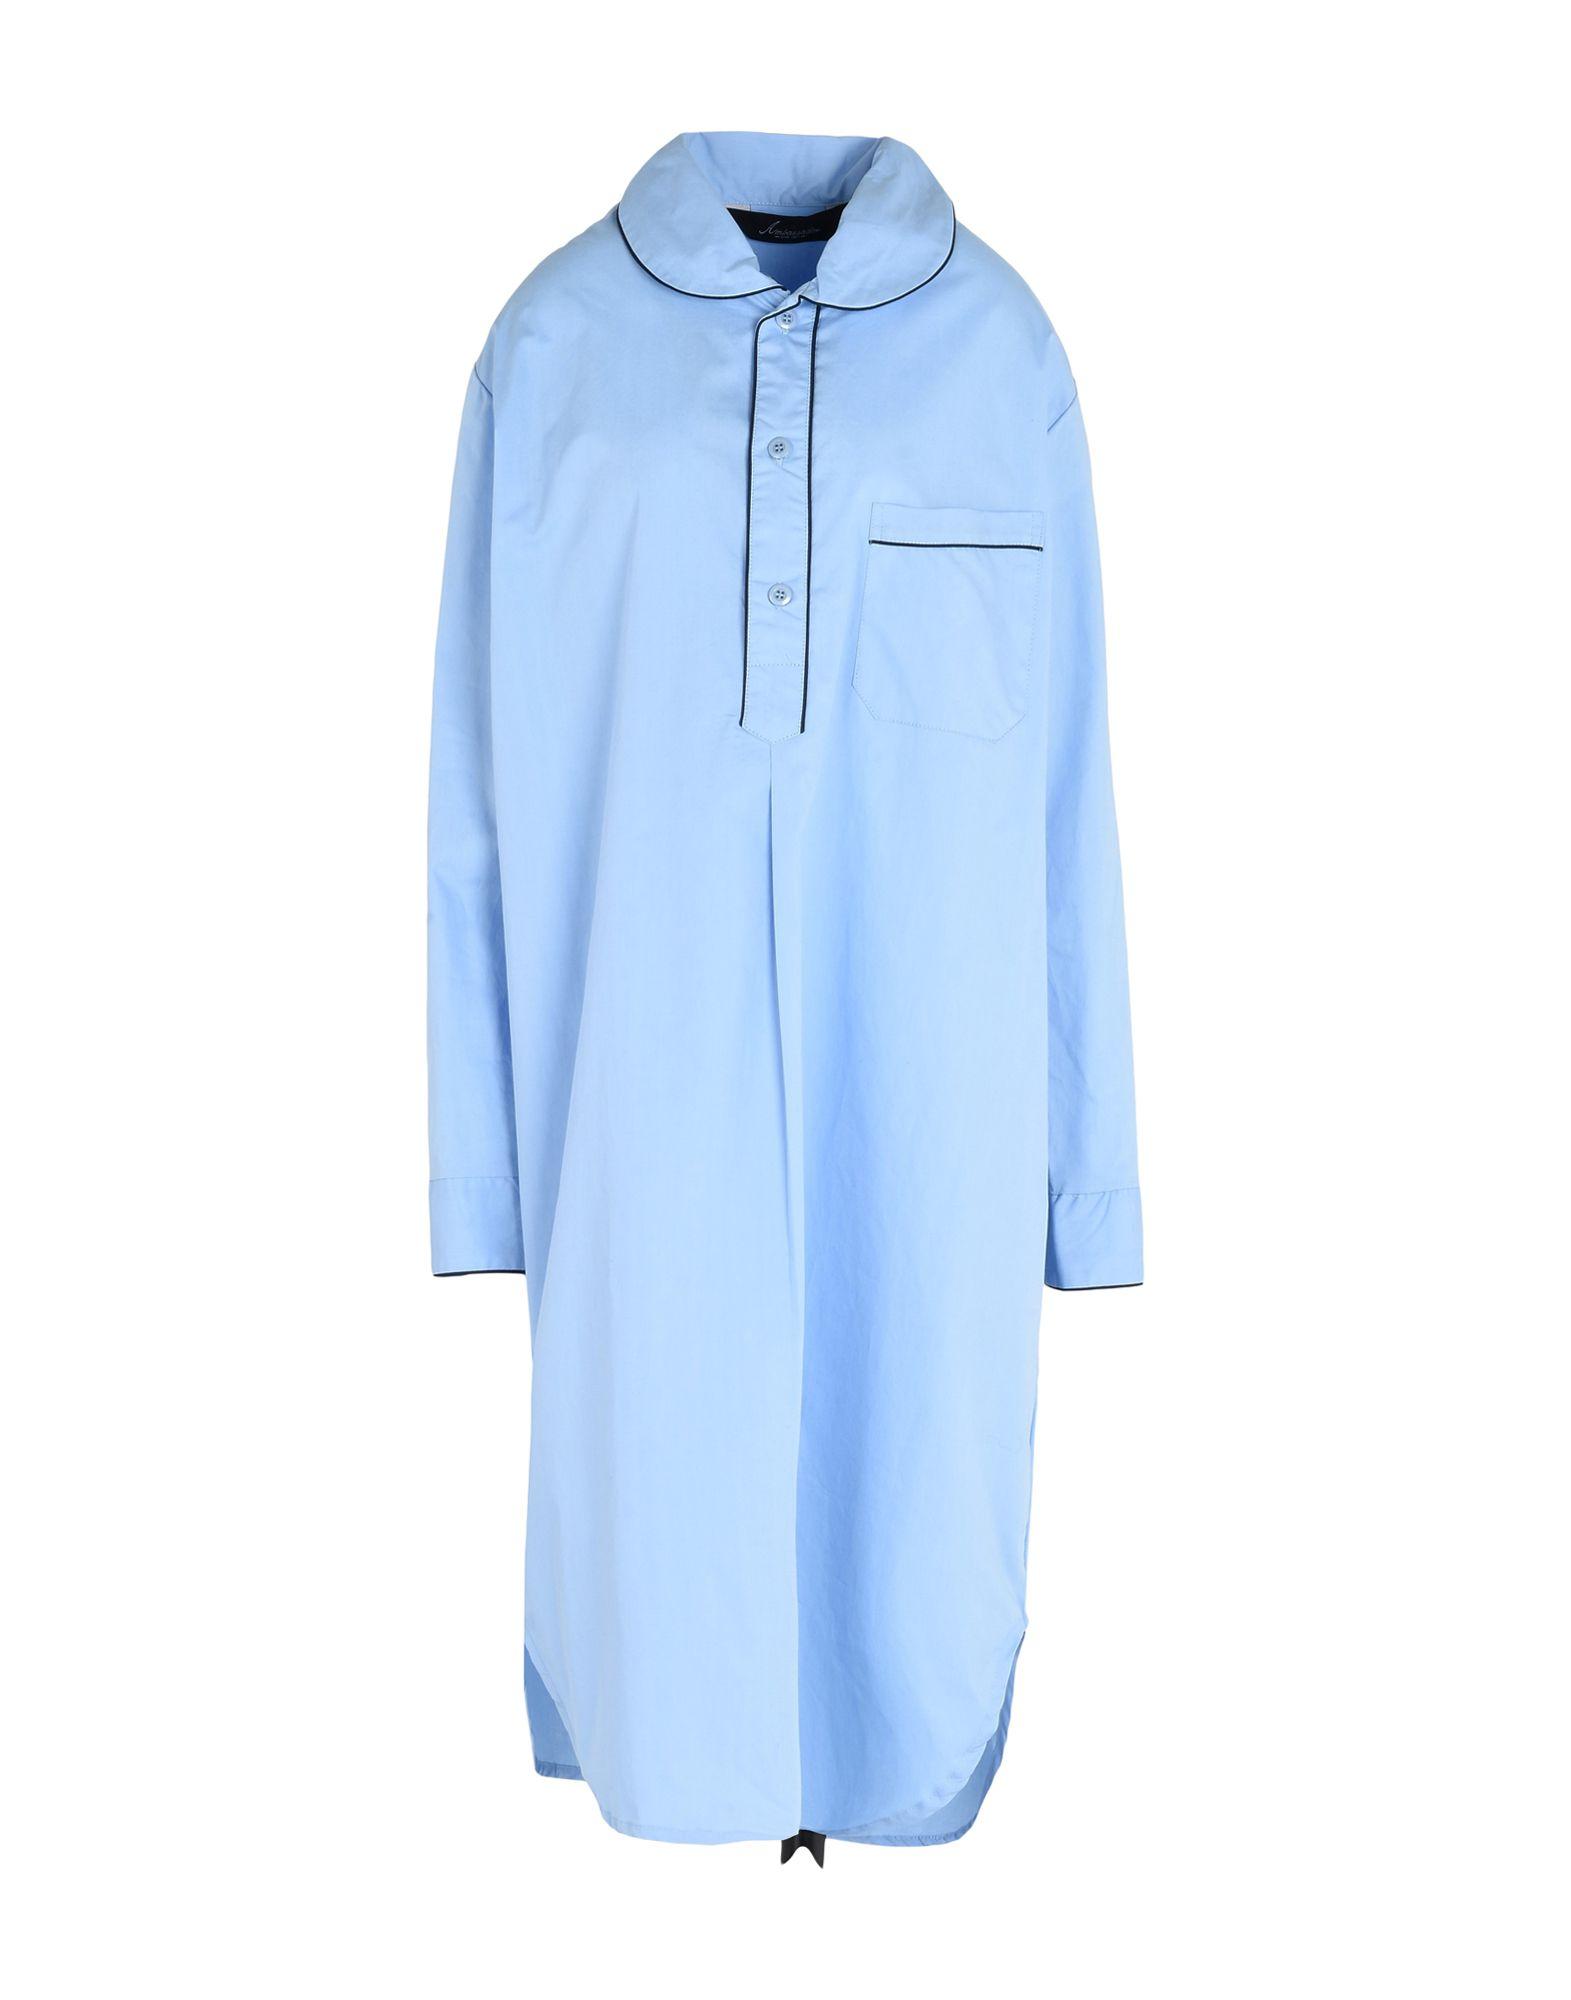 AMBASSADOR Damen Nachthemd Farbe Himmelblau Größe 8